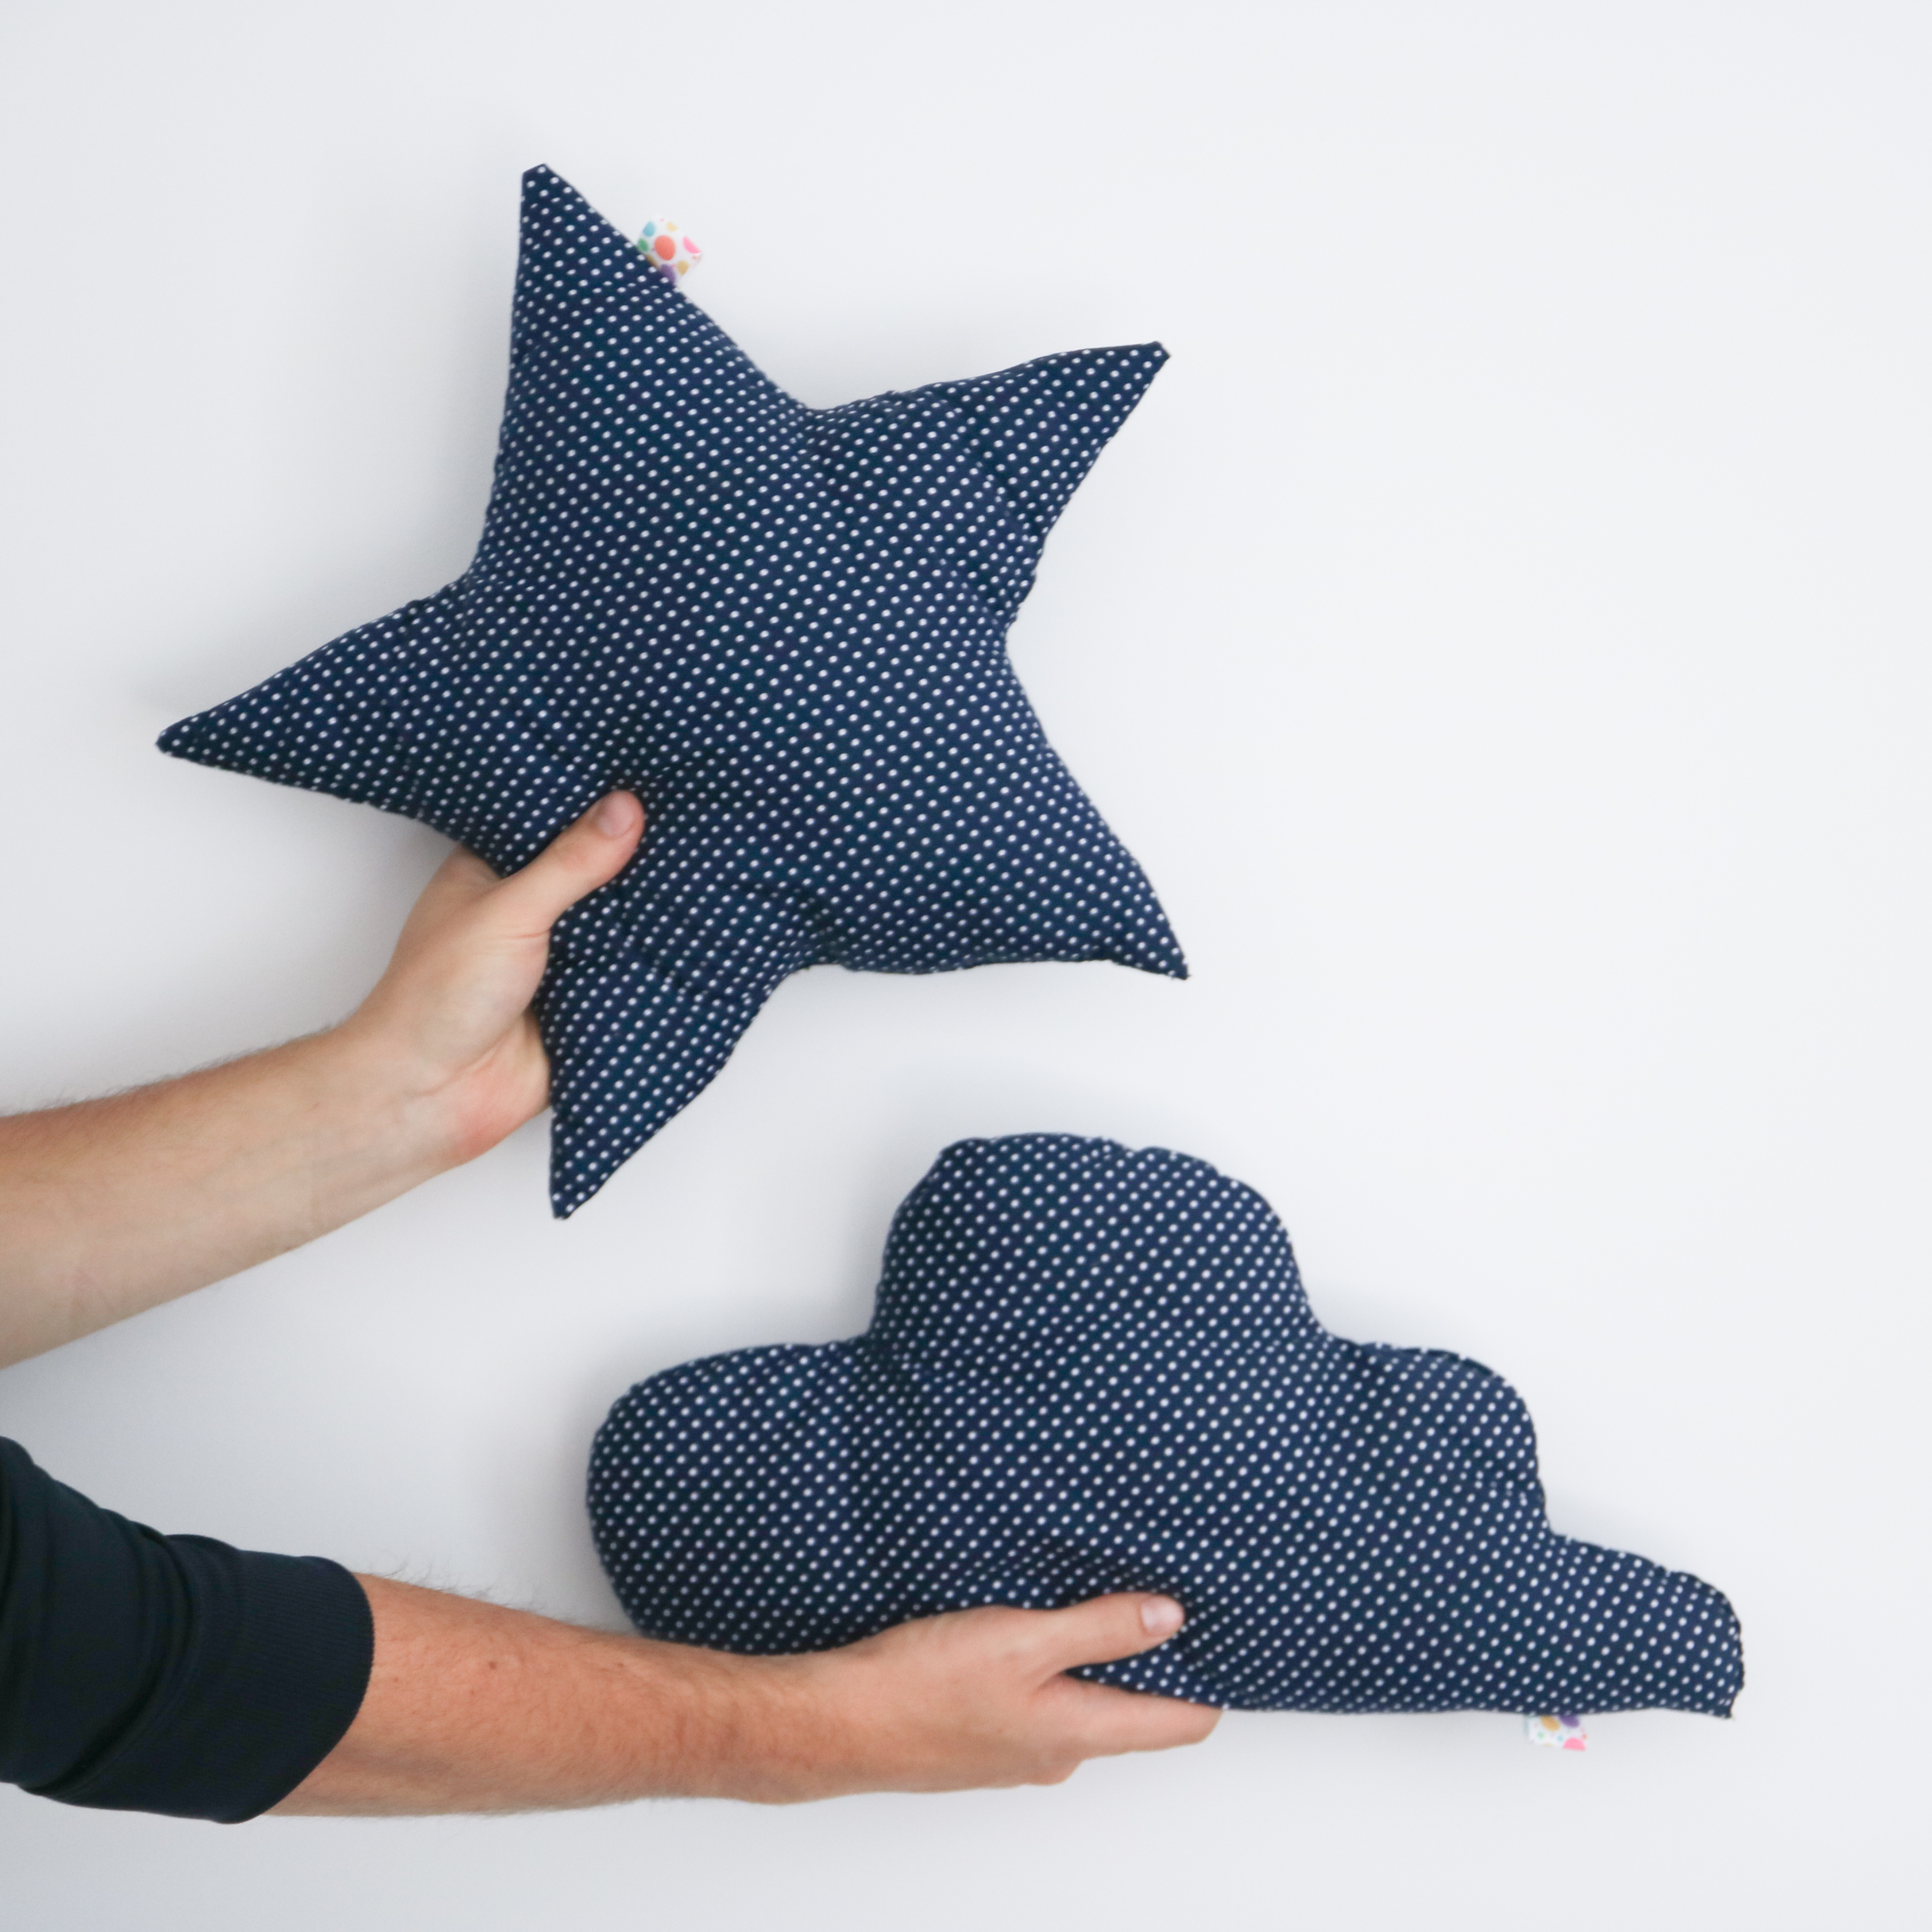 duo-coussin-confettis-jolis